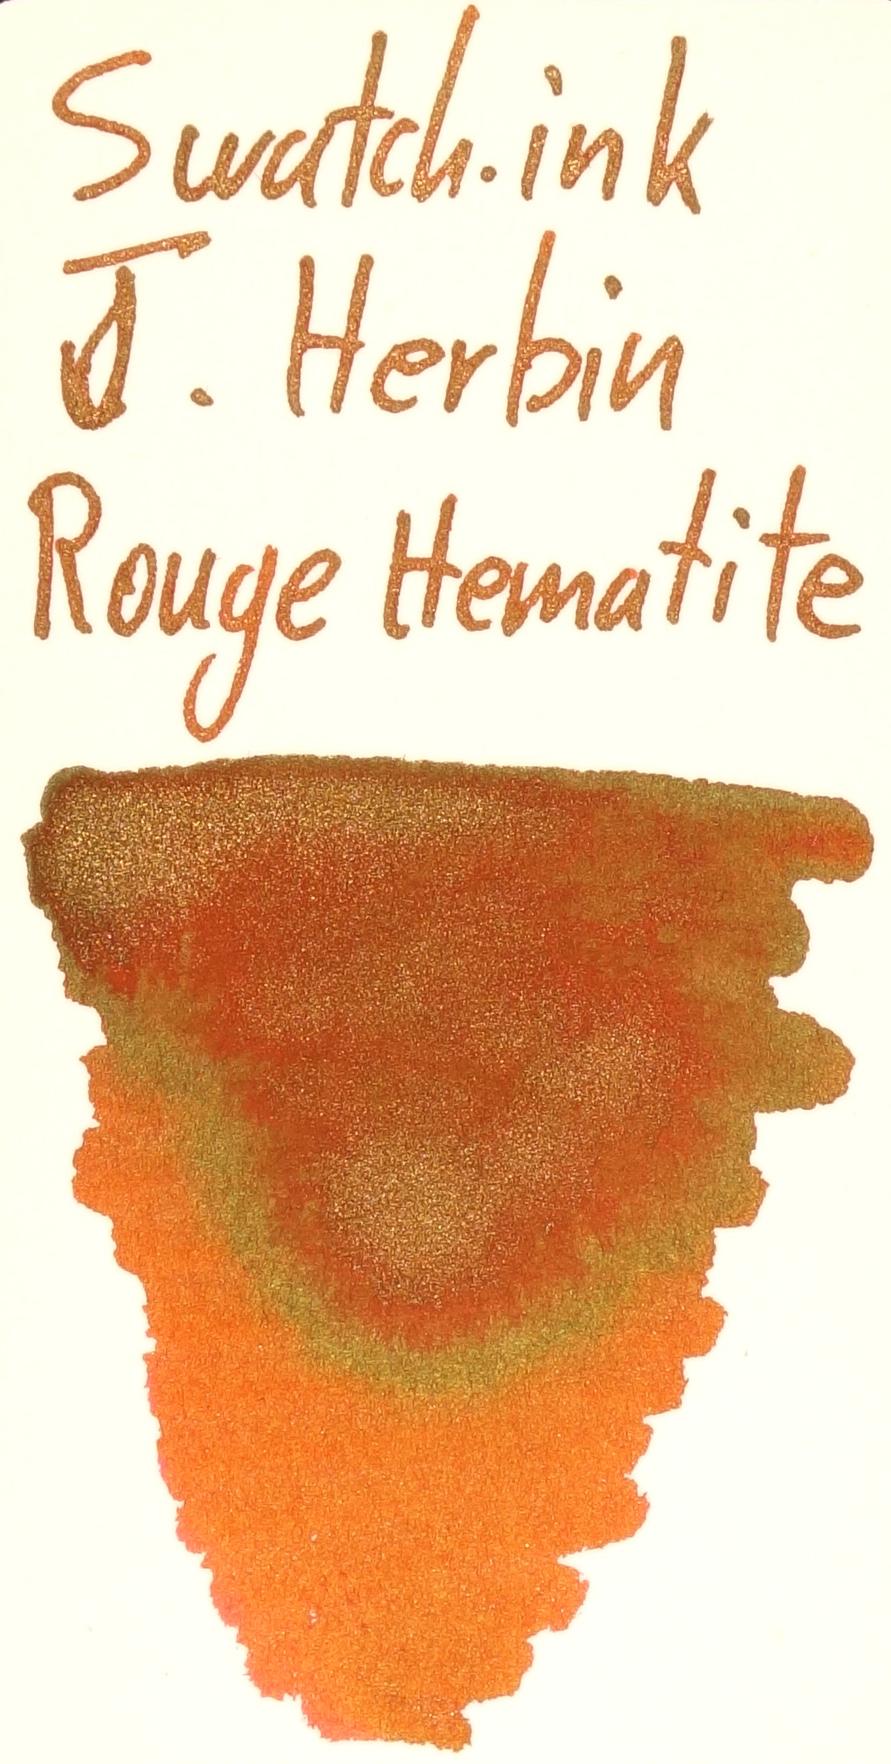 J. Herbin Rouge Hematite Swatch.ink.JPG